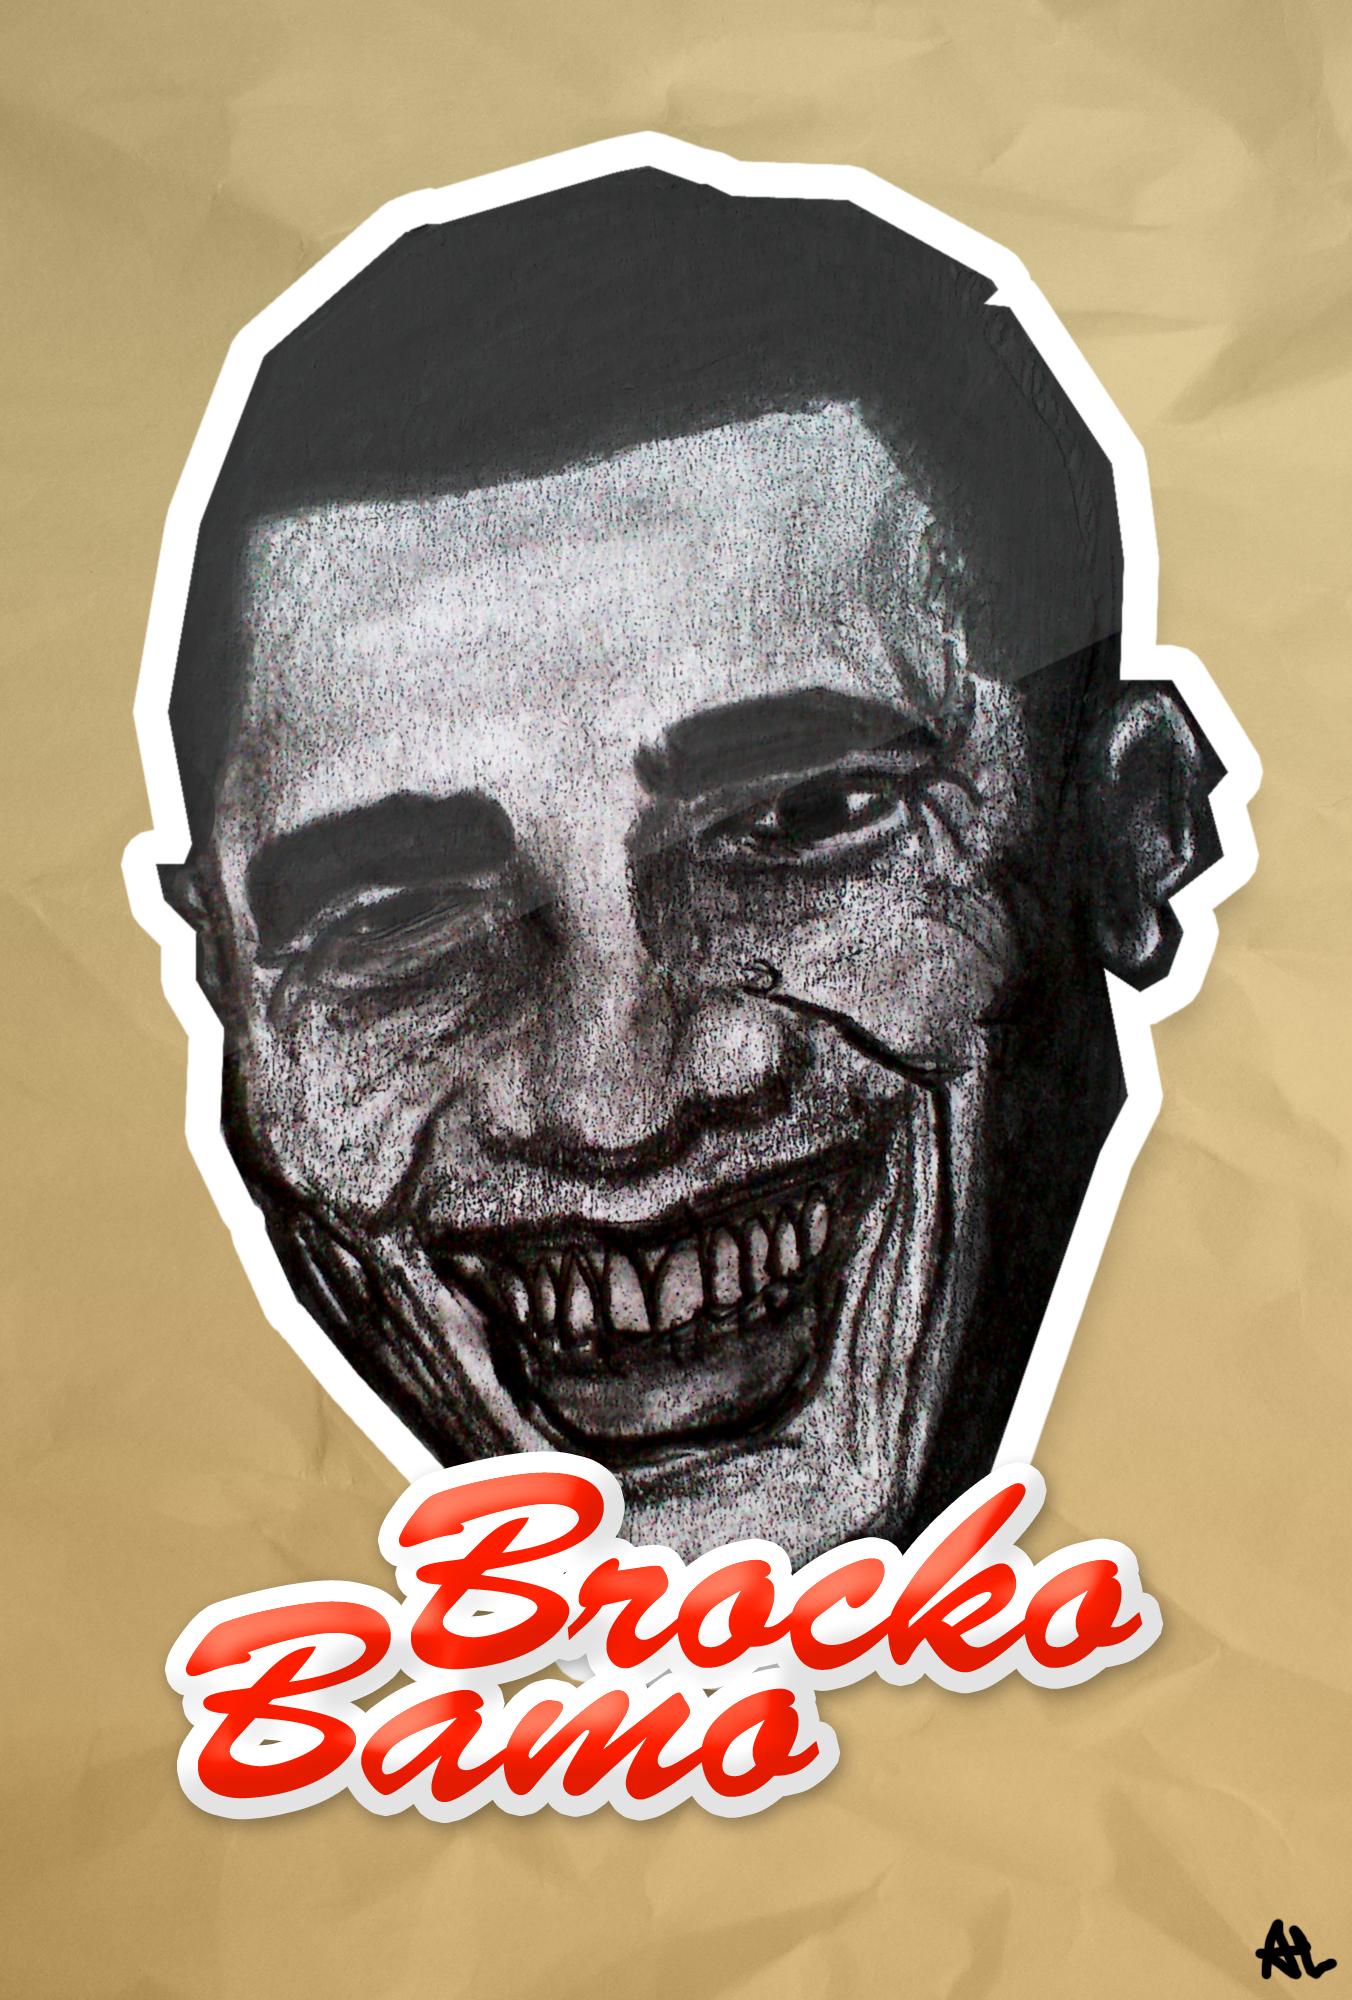 Brocko Bamo